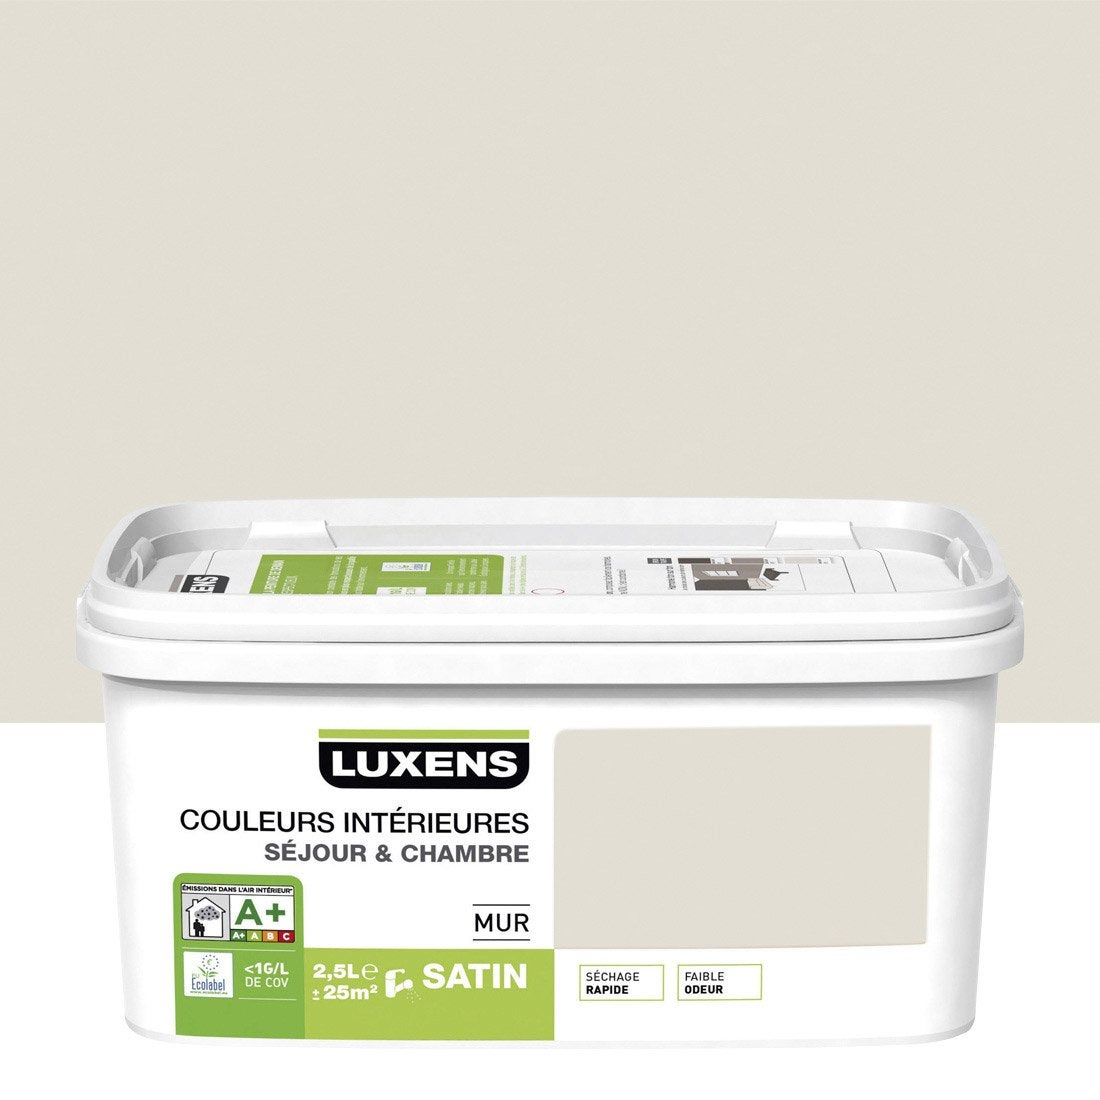 Peinture blanc lin 2 luxens couleurs int rieures 2 5 l - Leroy merlin peinture effet metal ...